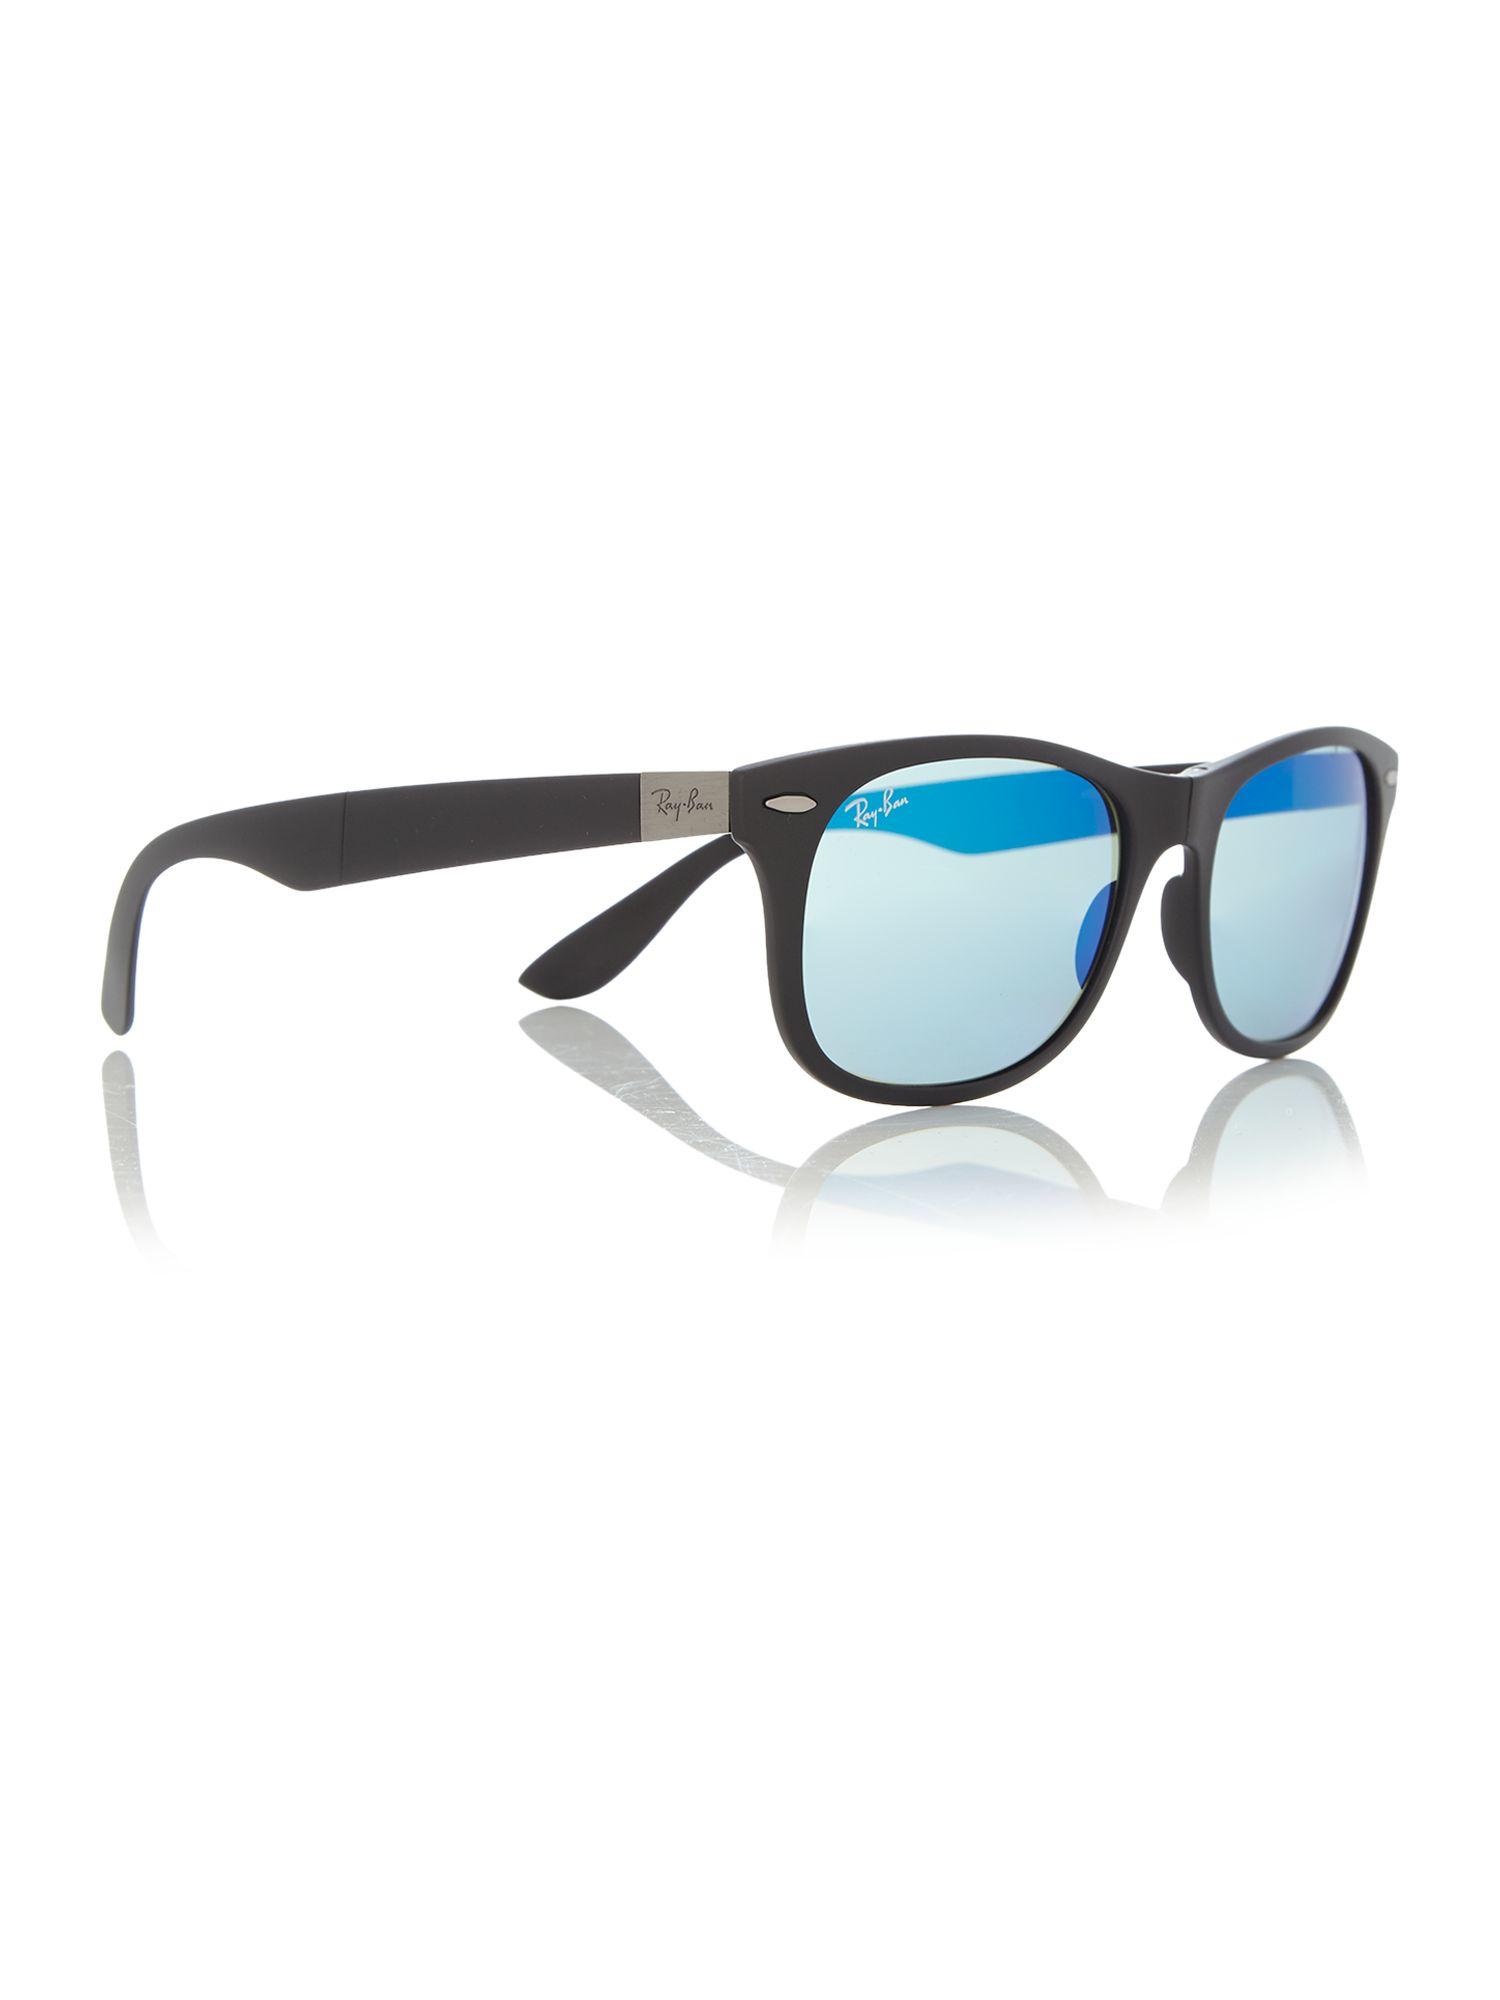 fe979e3591d Ray Ban Sunglasses Rectangle Black Frame